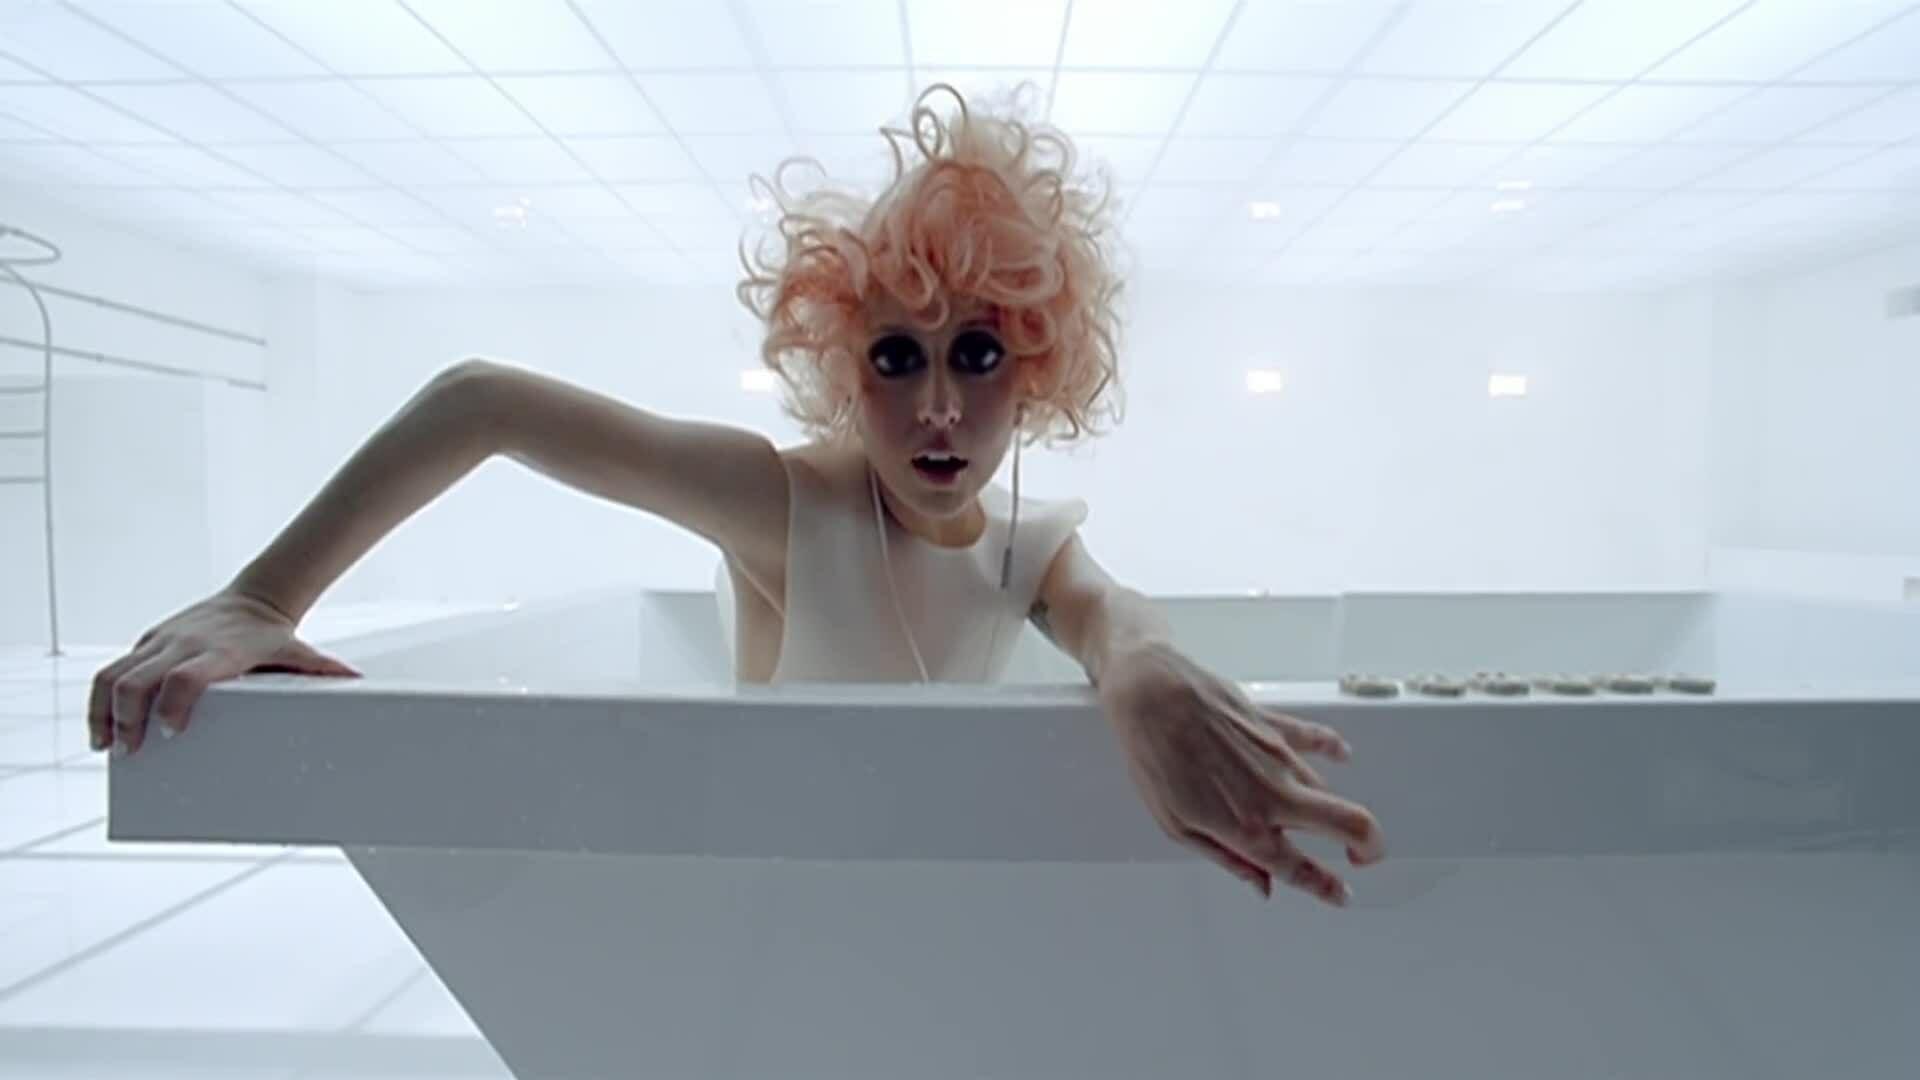 'Bad Romance' - Lady Gaga